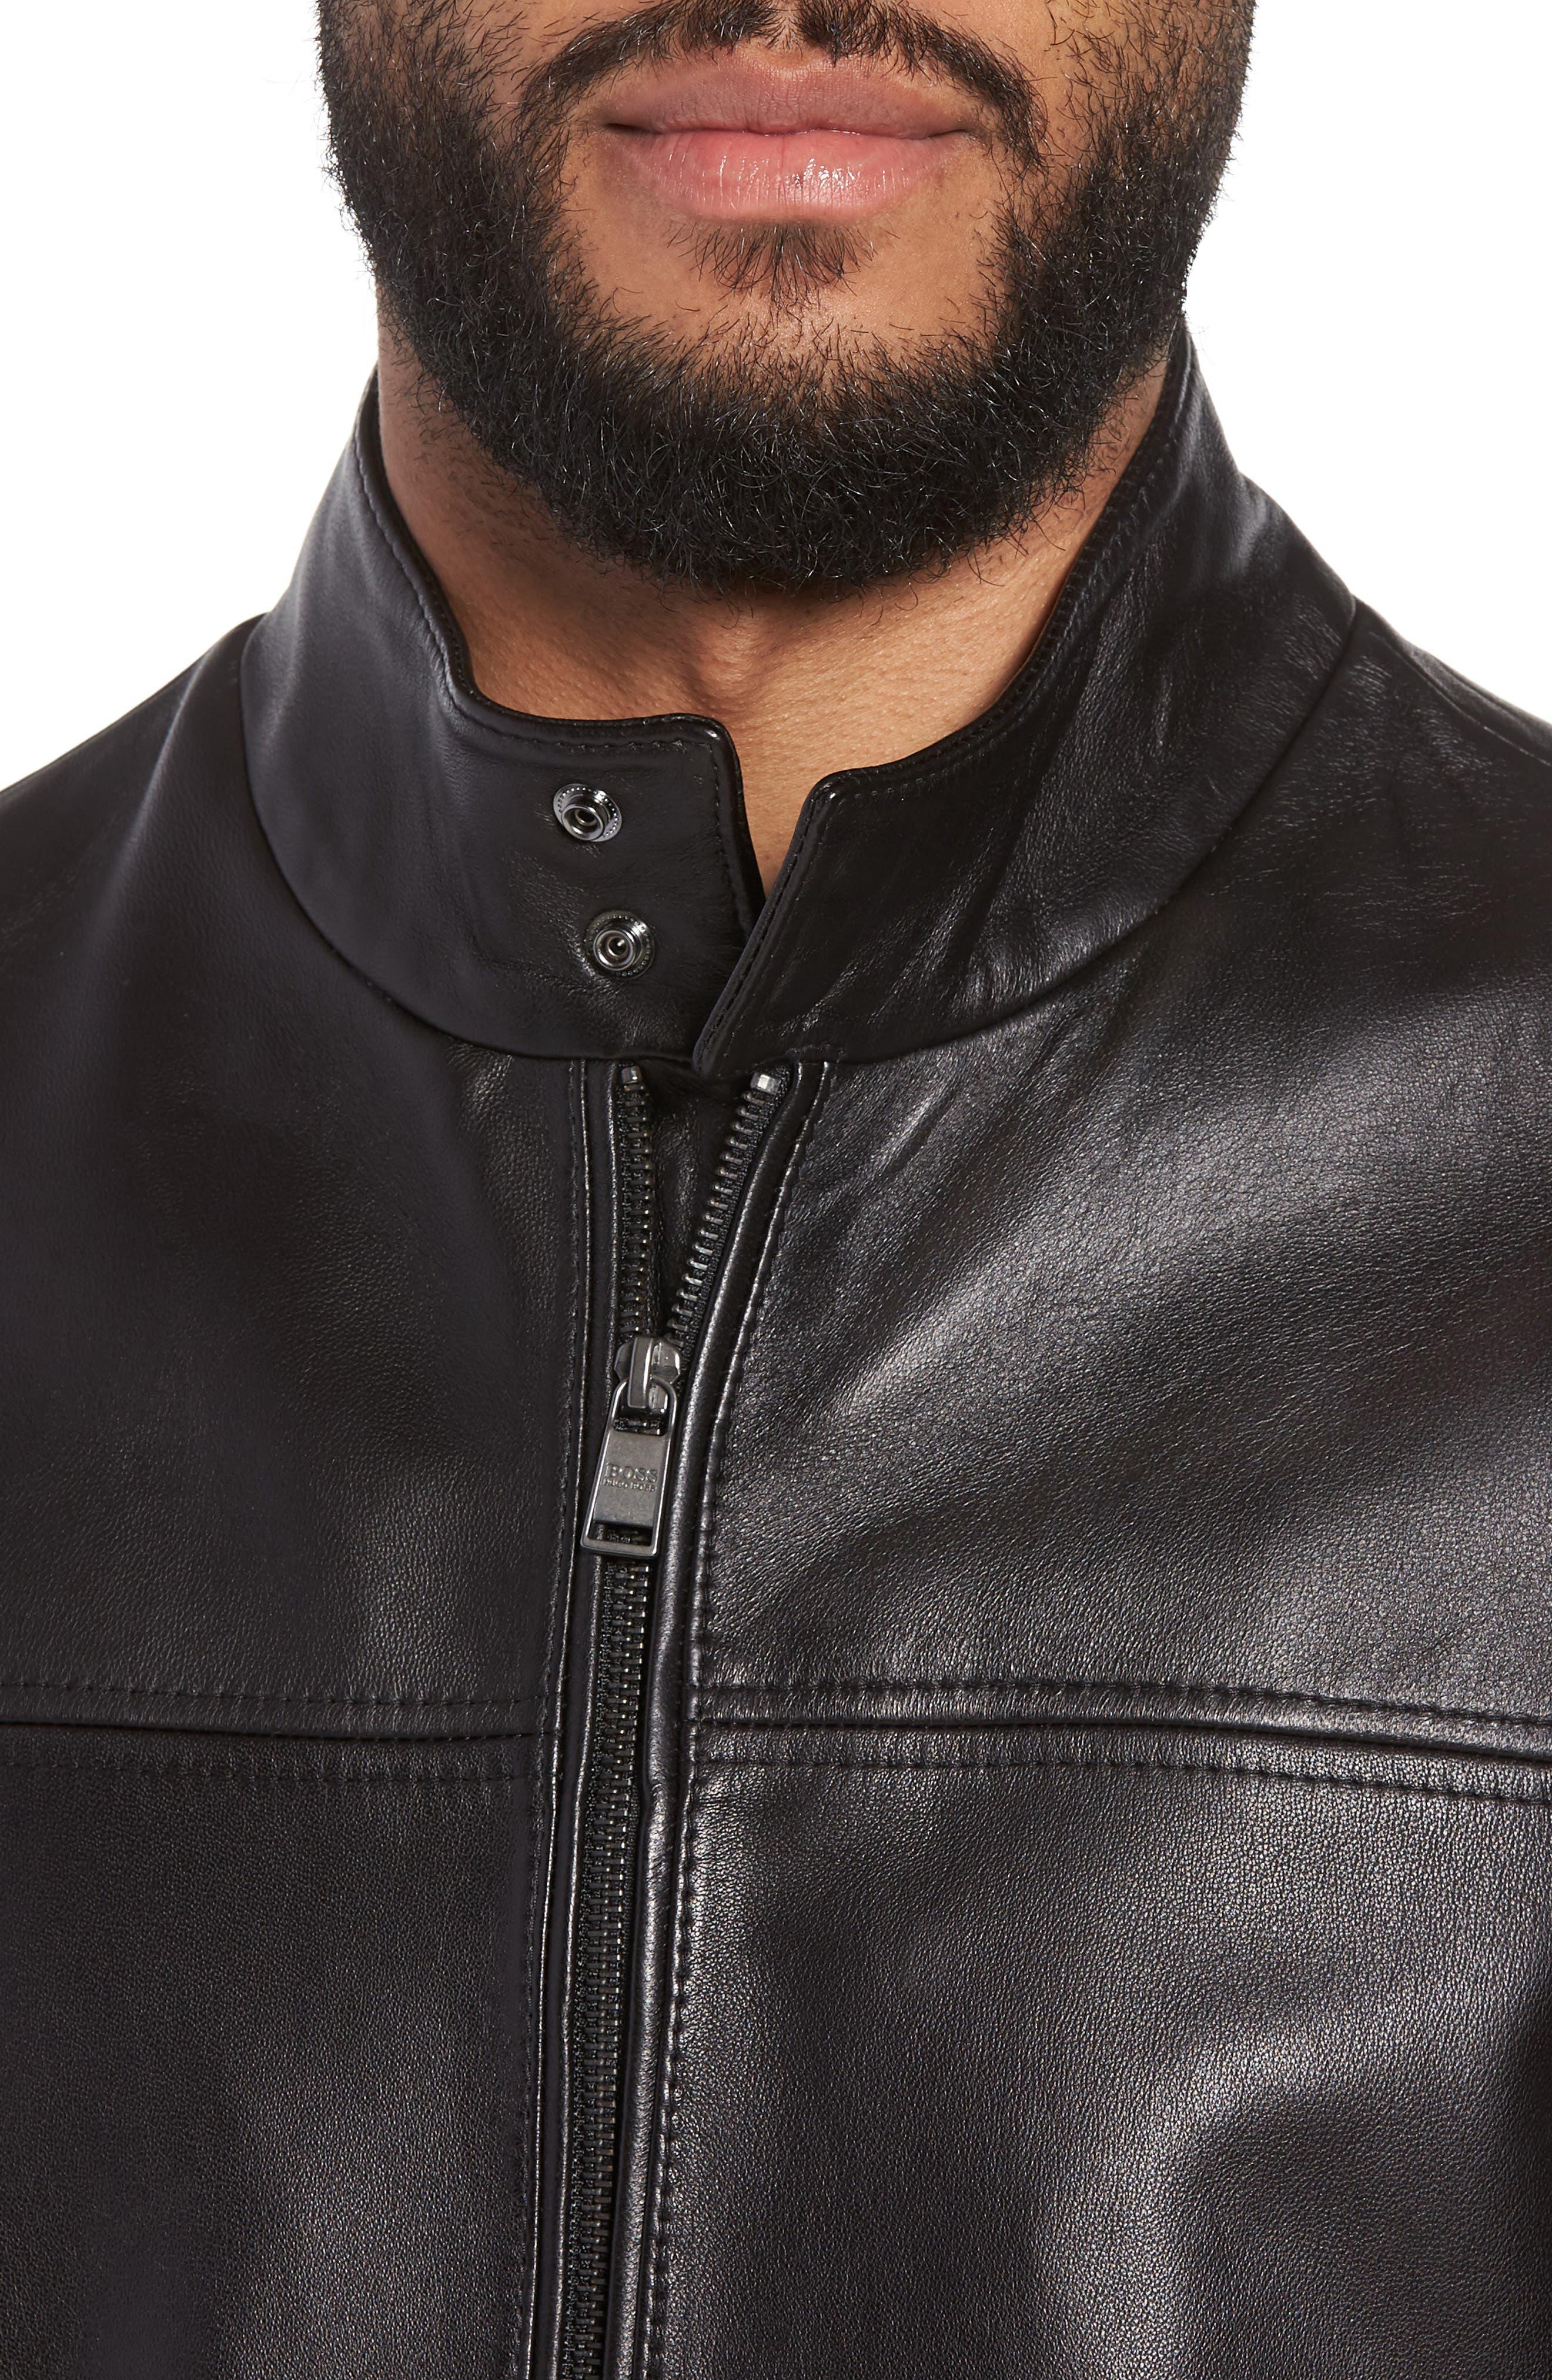 Nerous Leather jacket,                             Alternate thumbnail 4, color,                             001